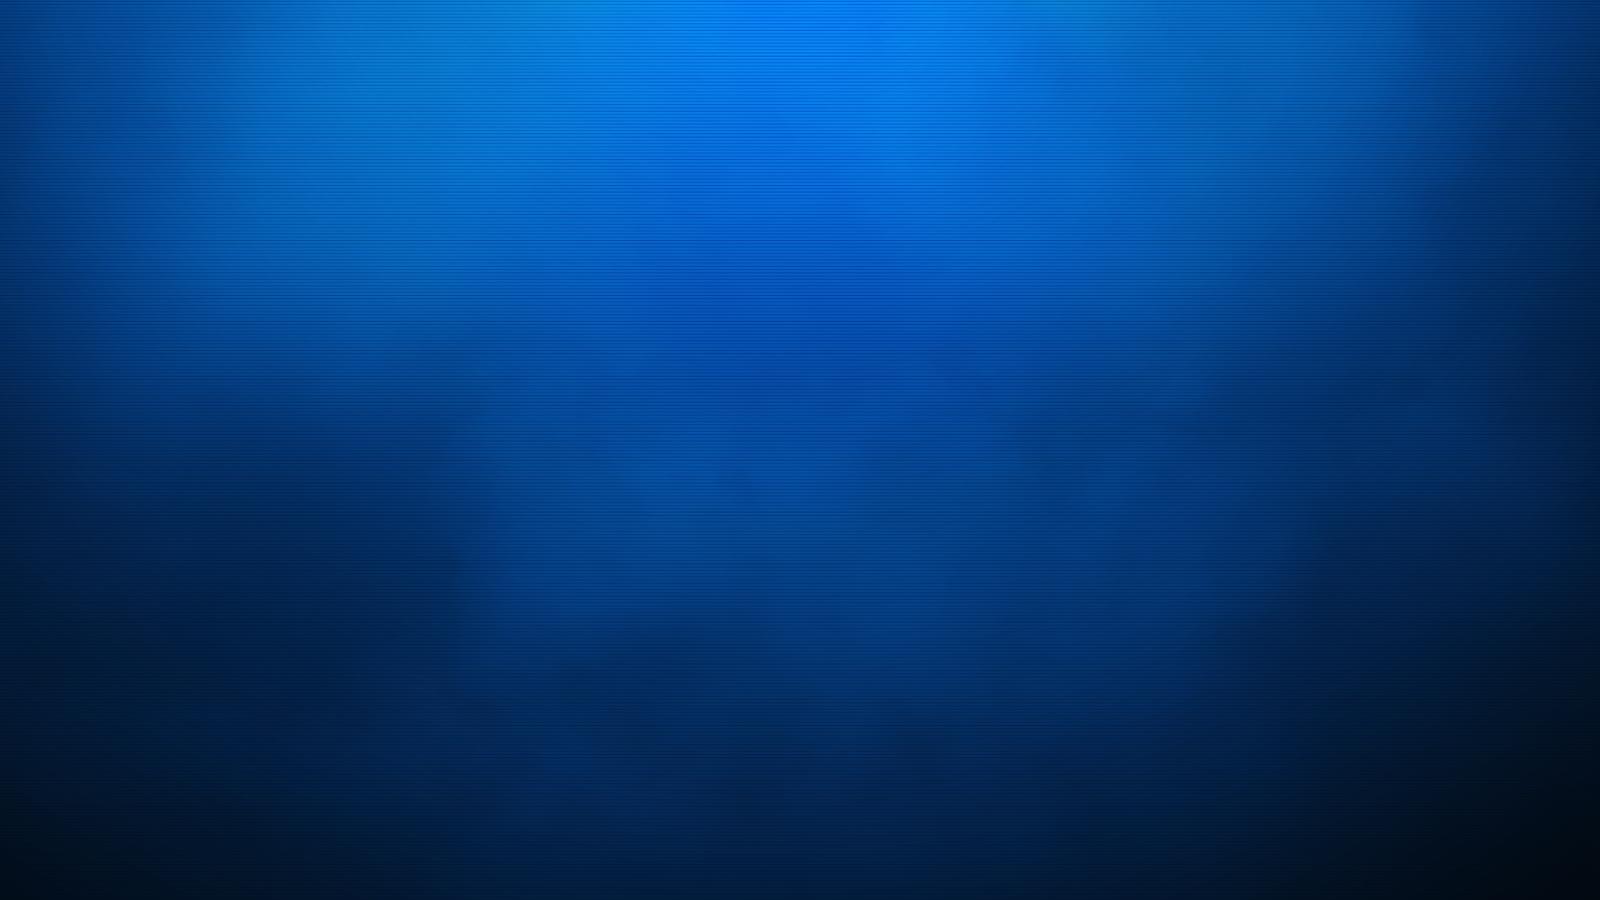 Градиент синего картинки